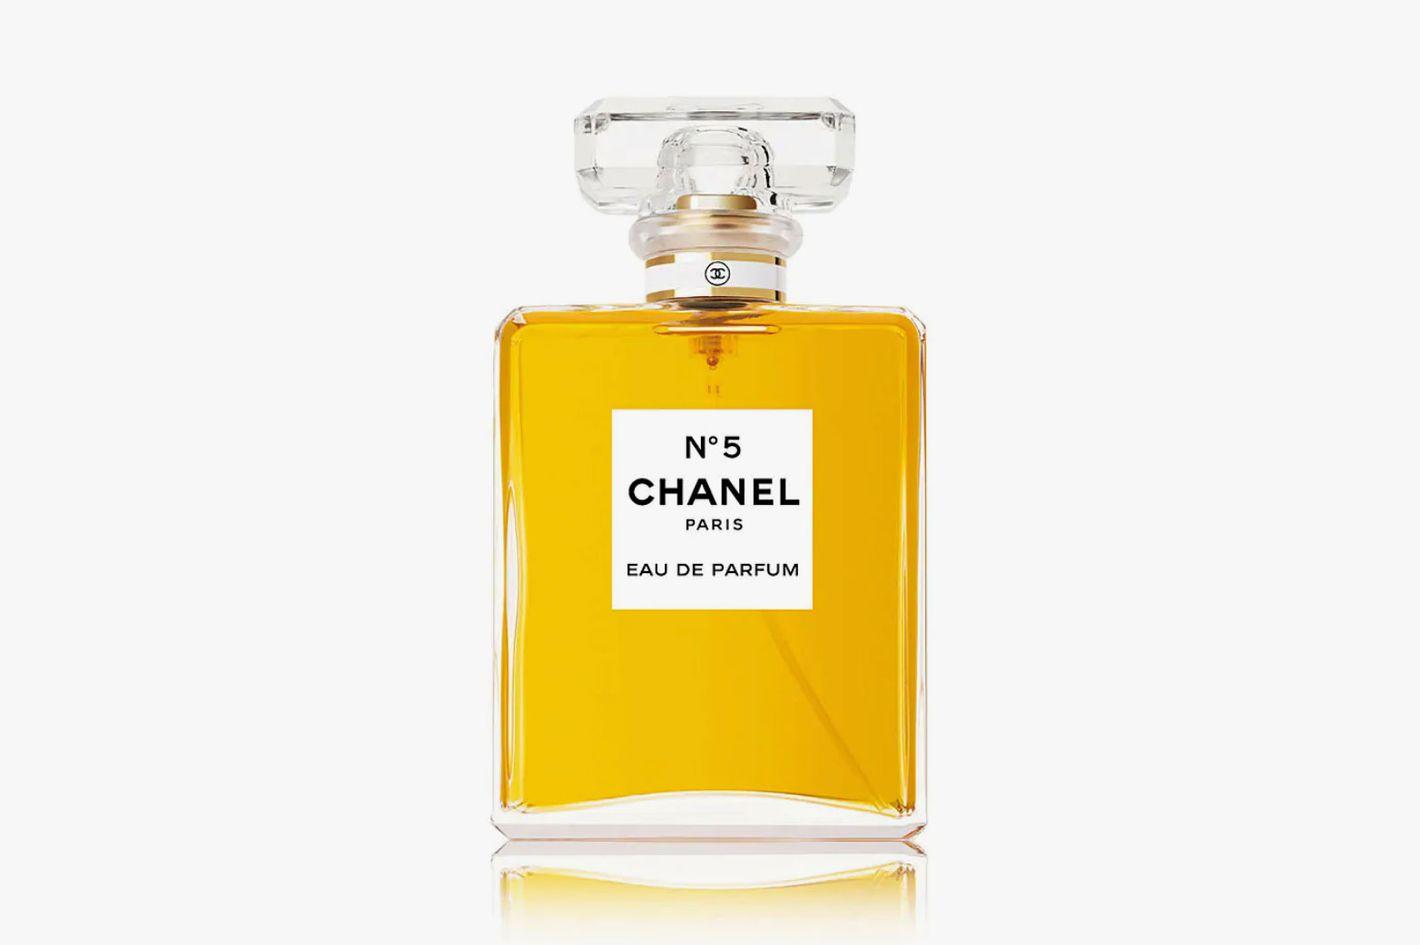 Chanel No. 5 Eau de Parfum